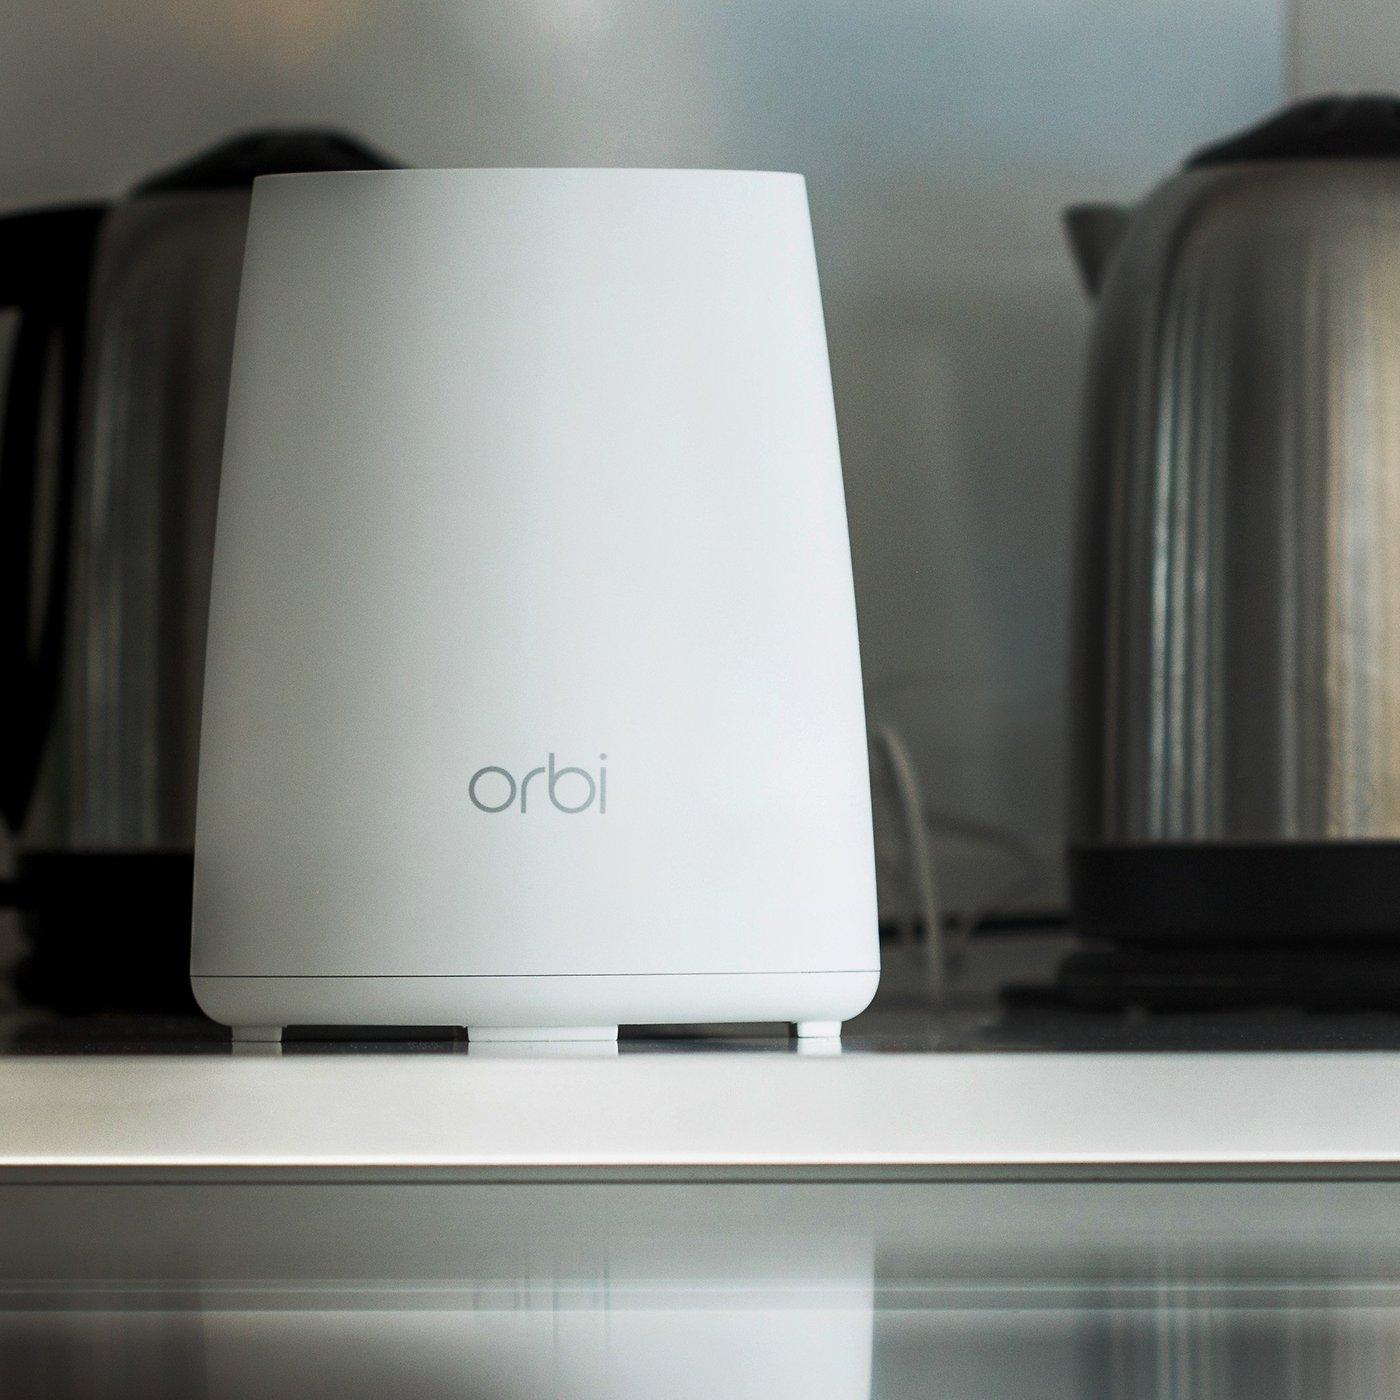 Netgear Orbi RBK40 review: Four times as fast as Google Wifi